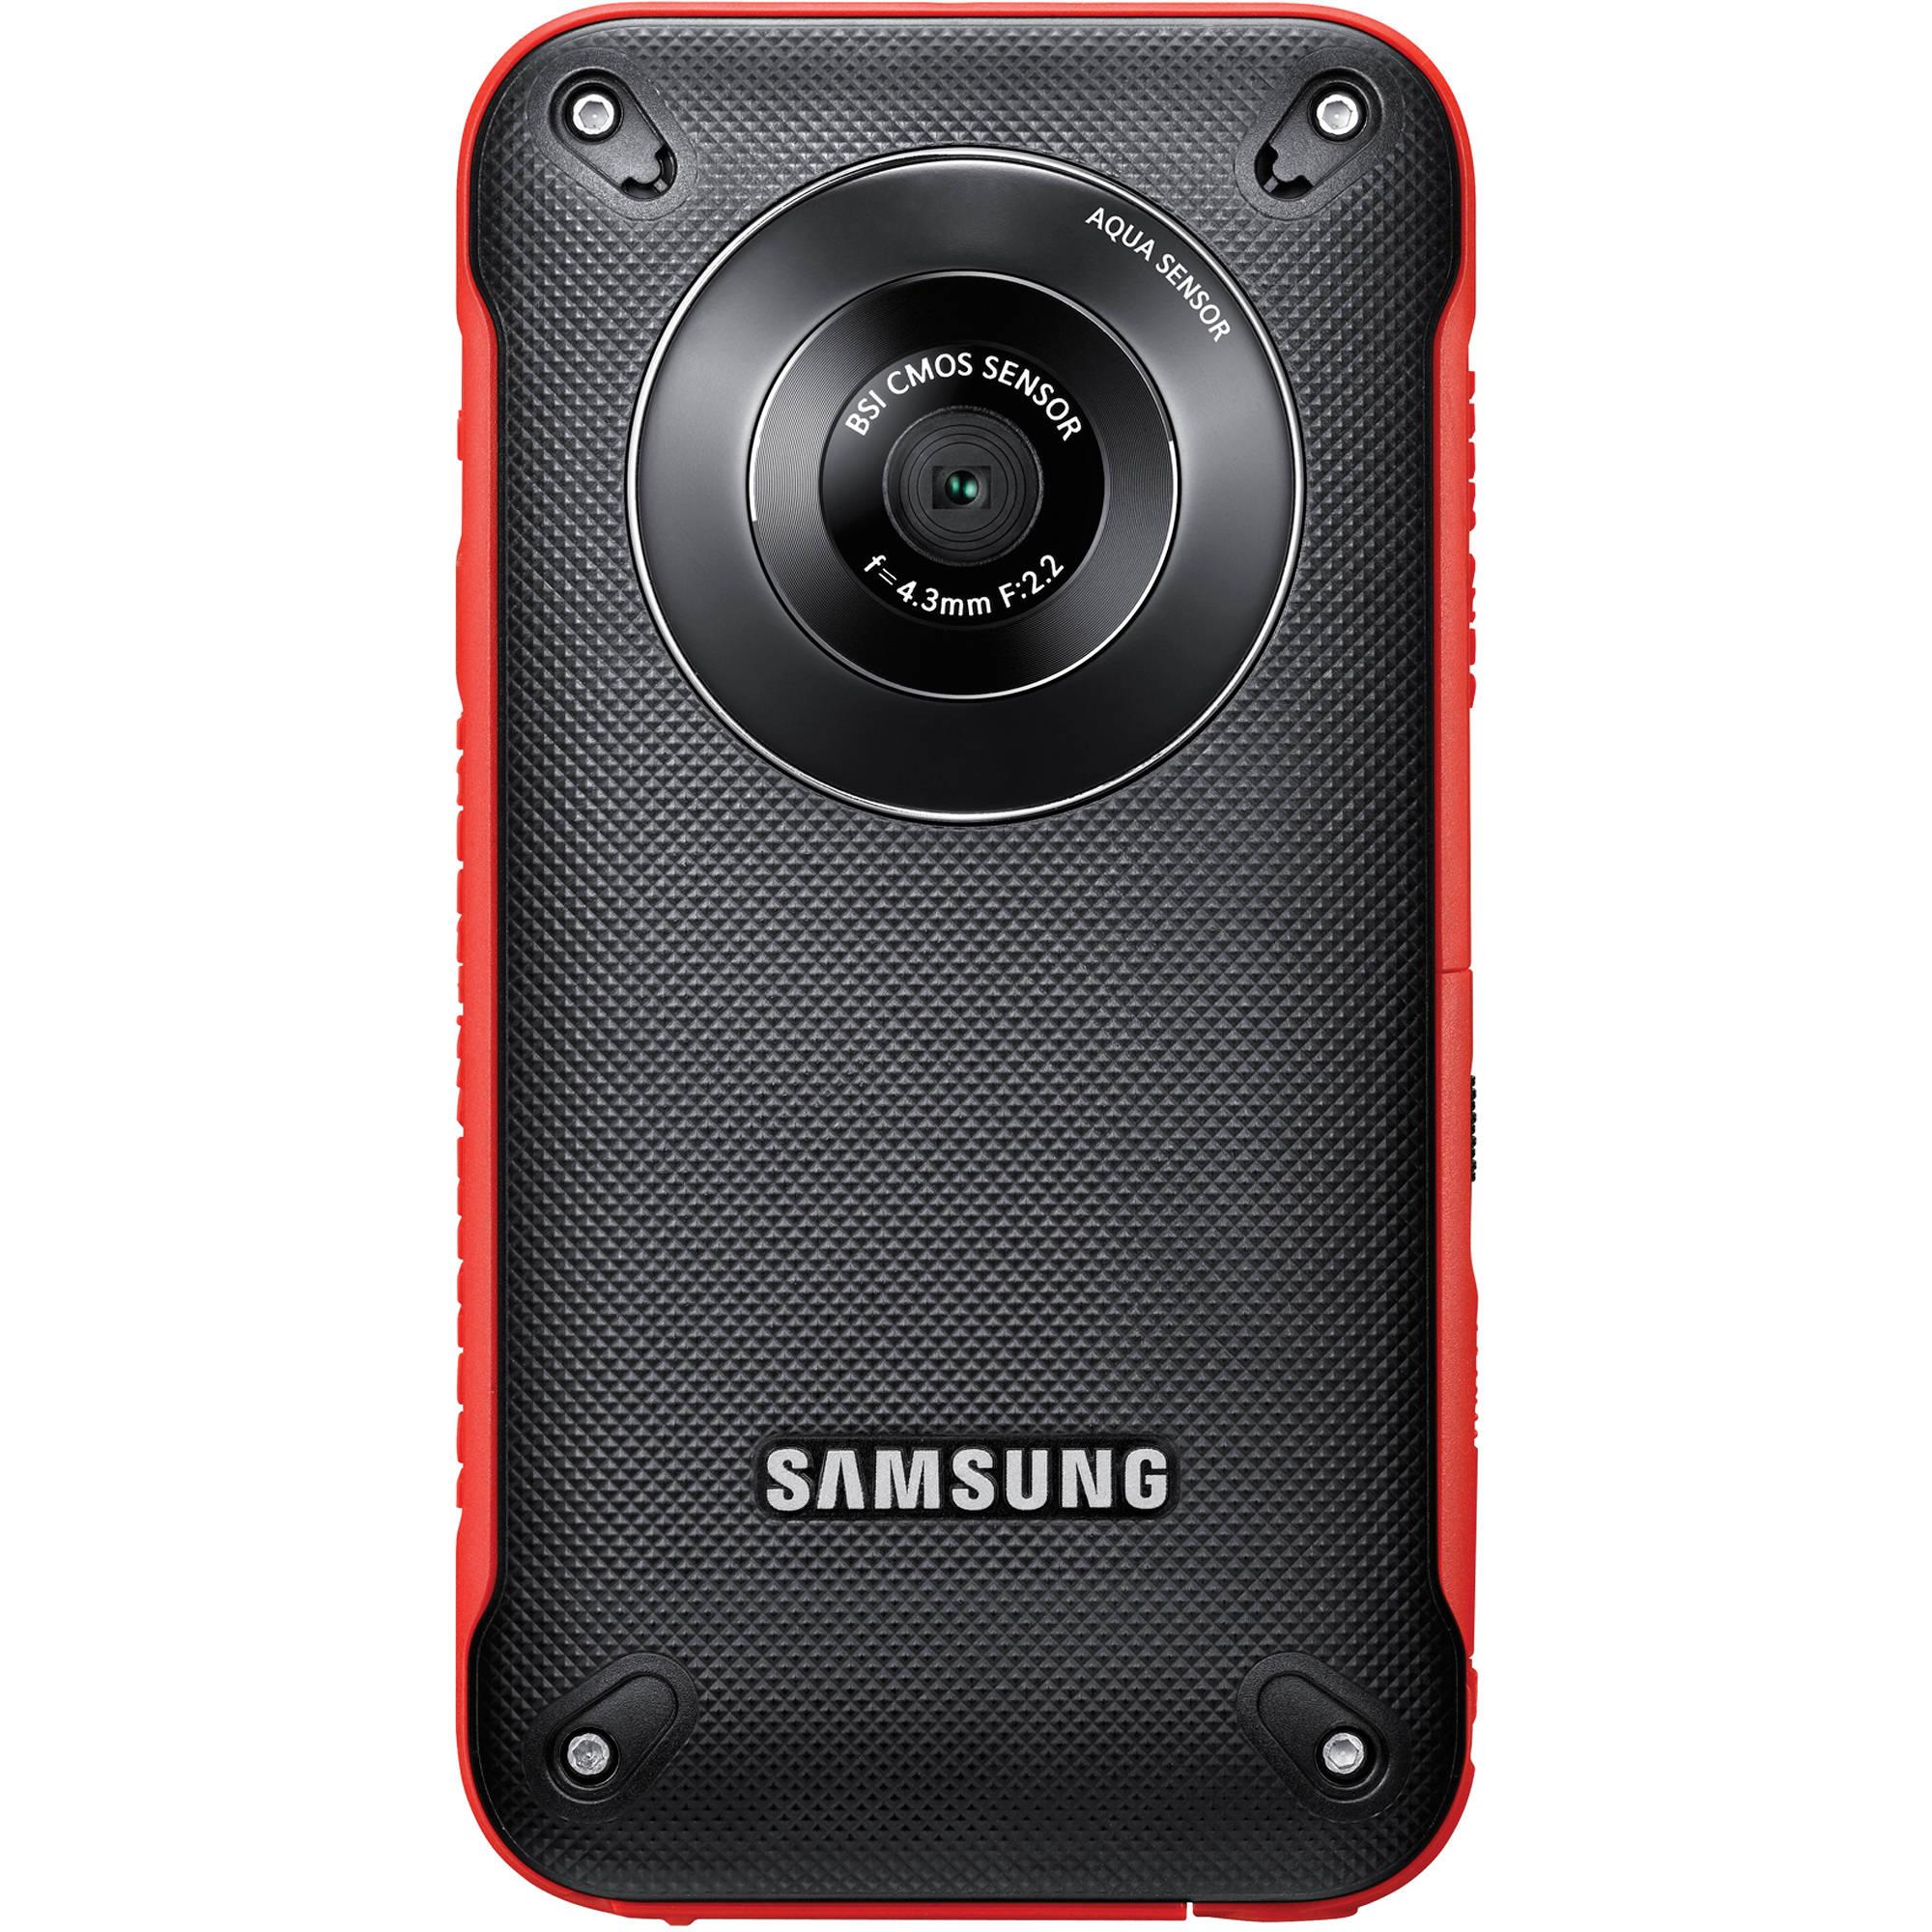 samsung hmx w300 pocket camcorder red hmx w300rn xaa b h photo rh bhphotovideo com Sample Photos Samsung W300 Samsung Camera HMX W 300